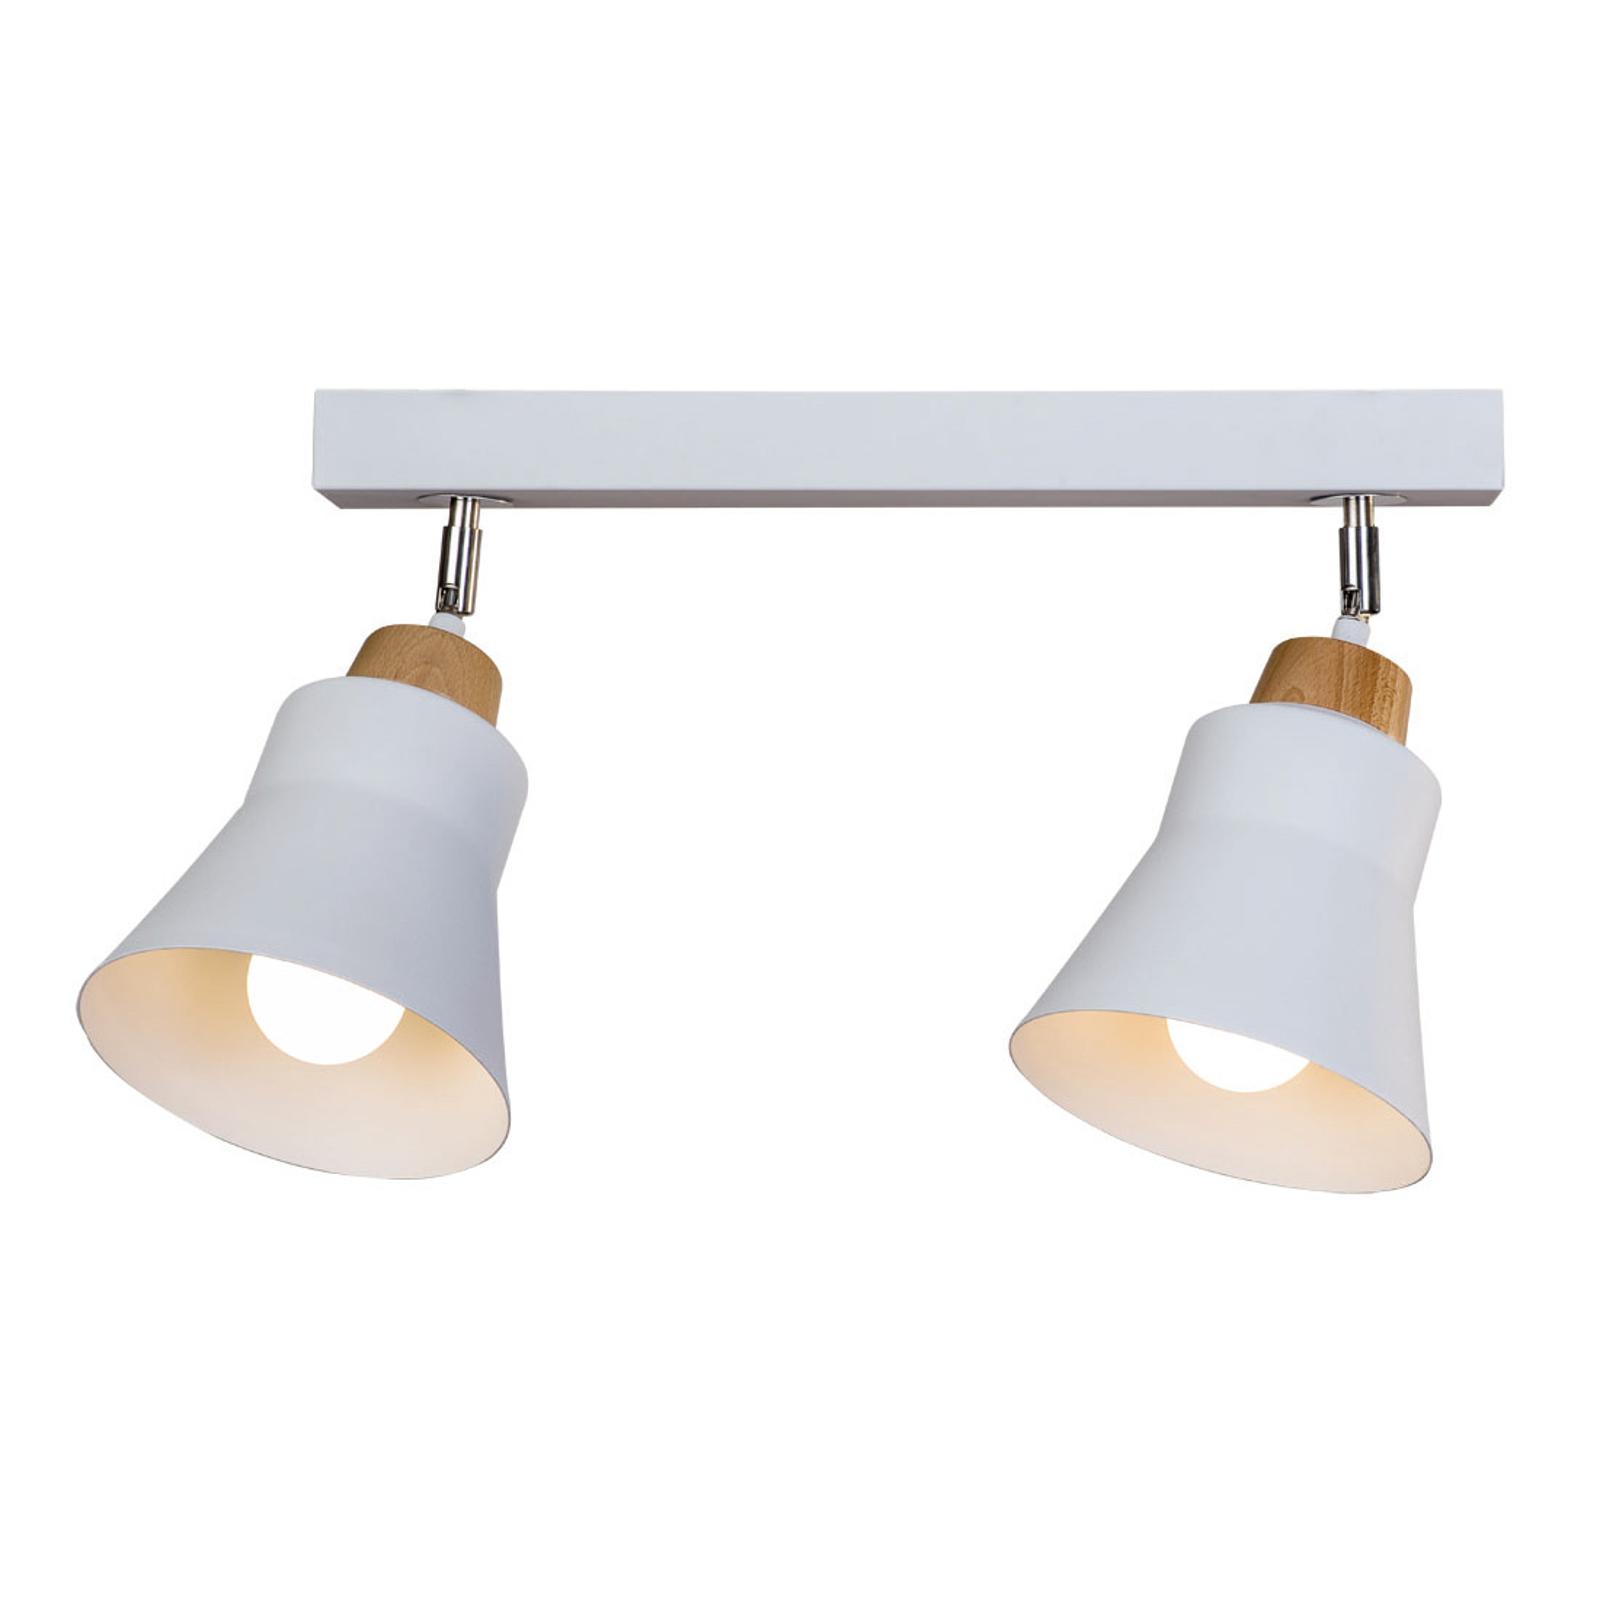 Plafondlamp Wood, 2-lamps, wit